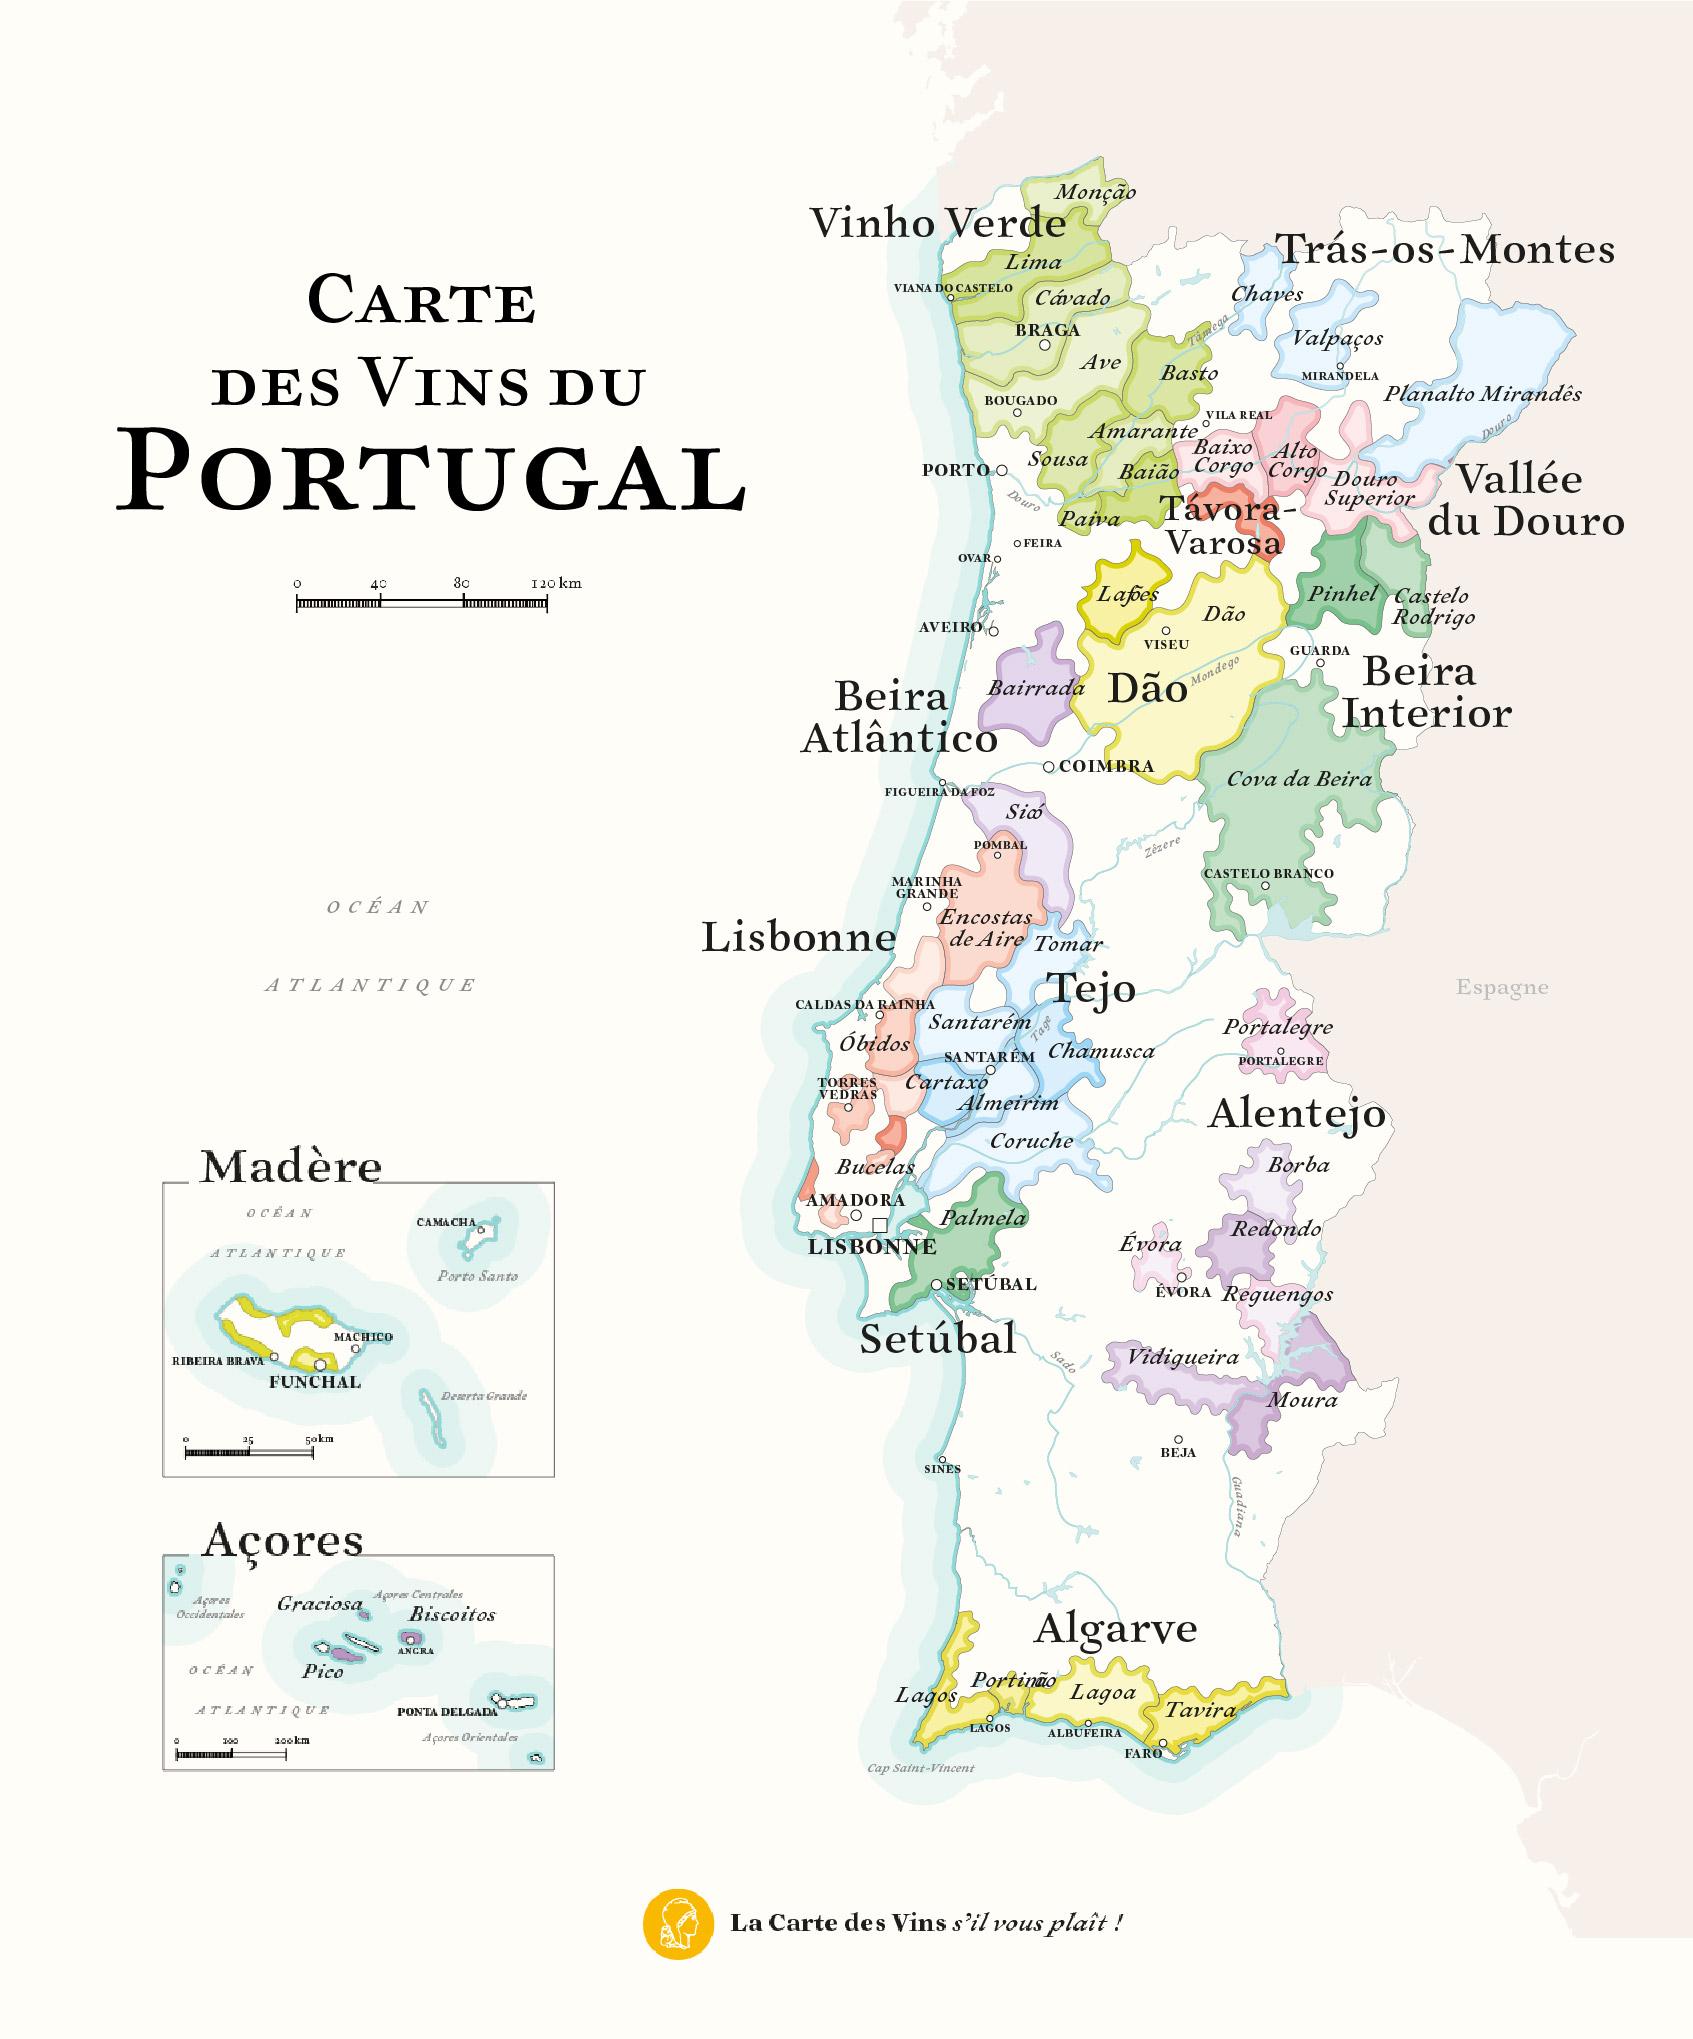 Carte-vins-Portugal-wine-map